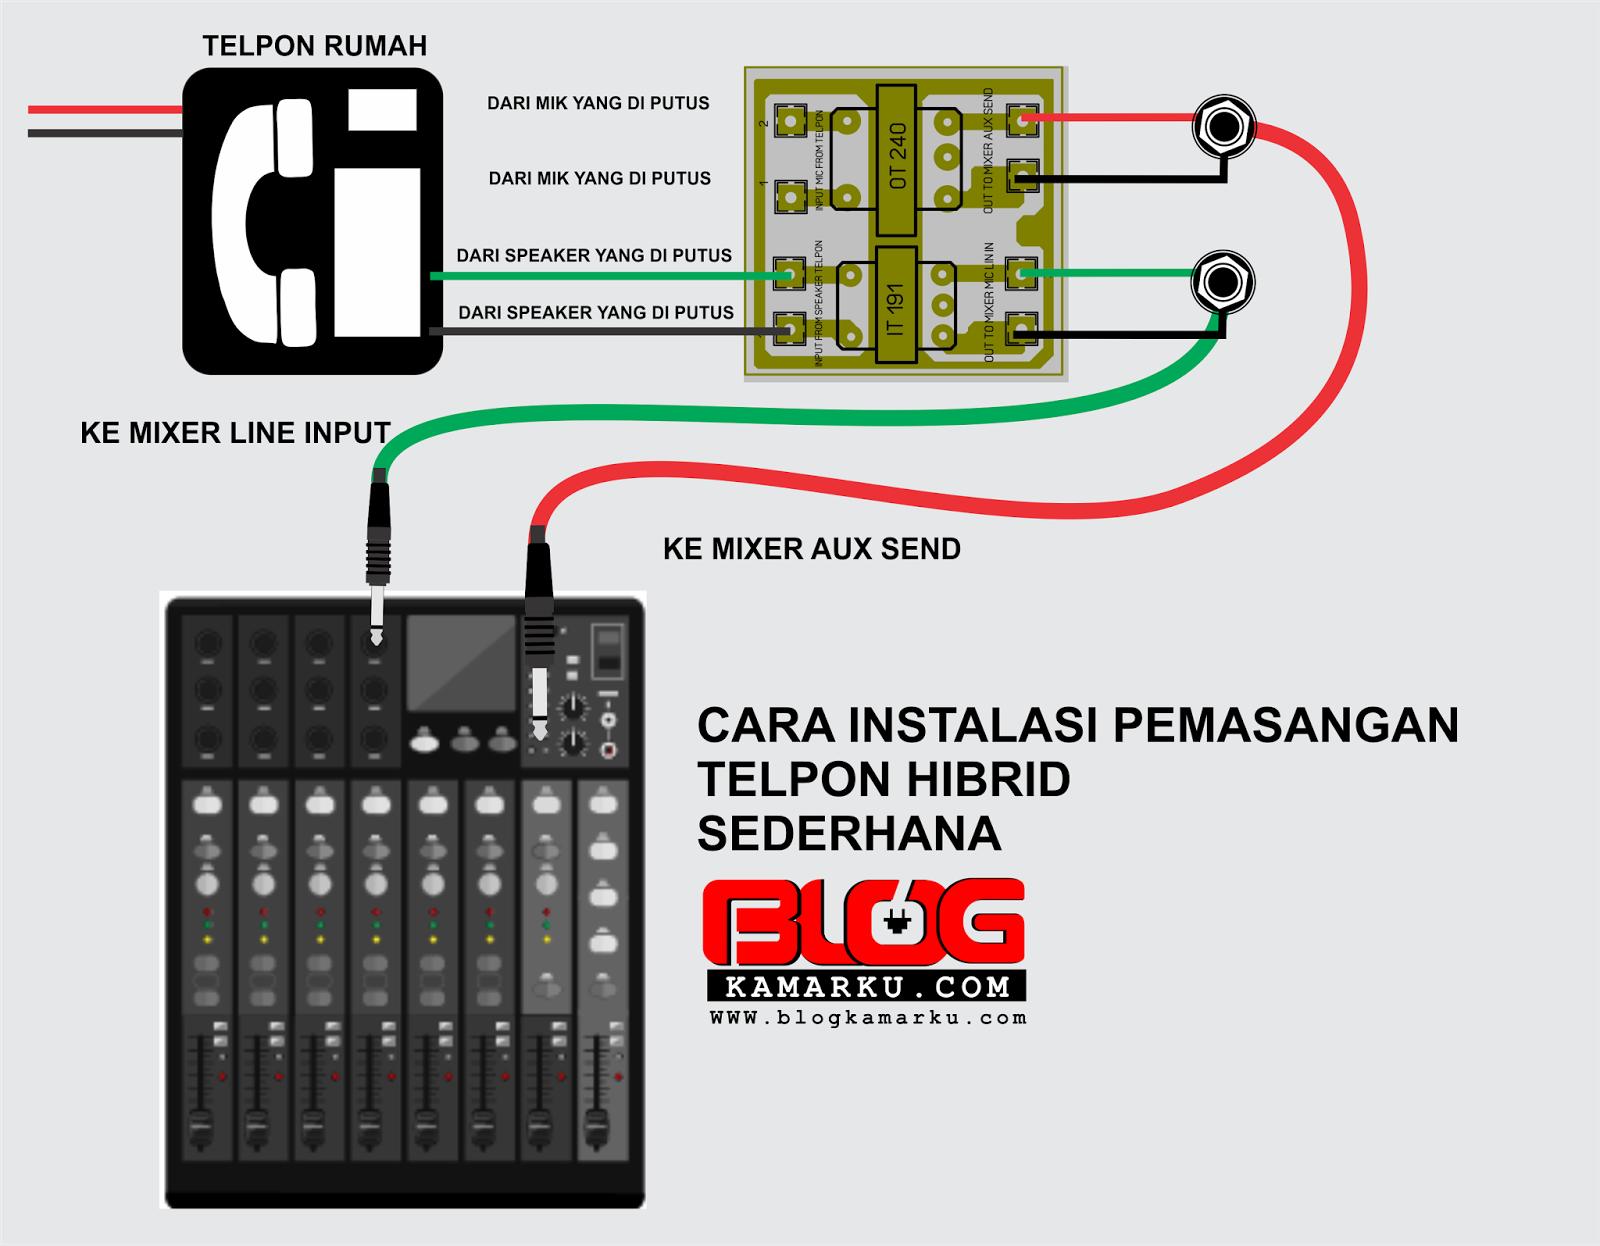 Pcb Layout Gitar Effeck Litle Angle Stombox Tone Control Mono Modifikasi Dan Assesoris Cara Membuat Telpon Hybrid On Air Sederhana